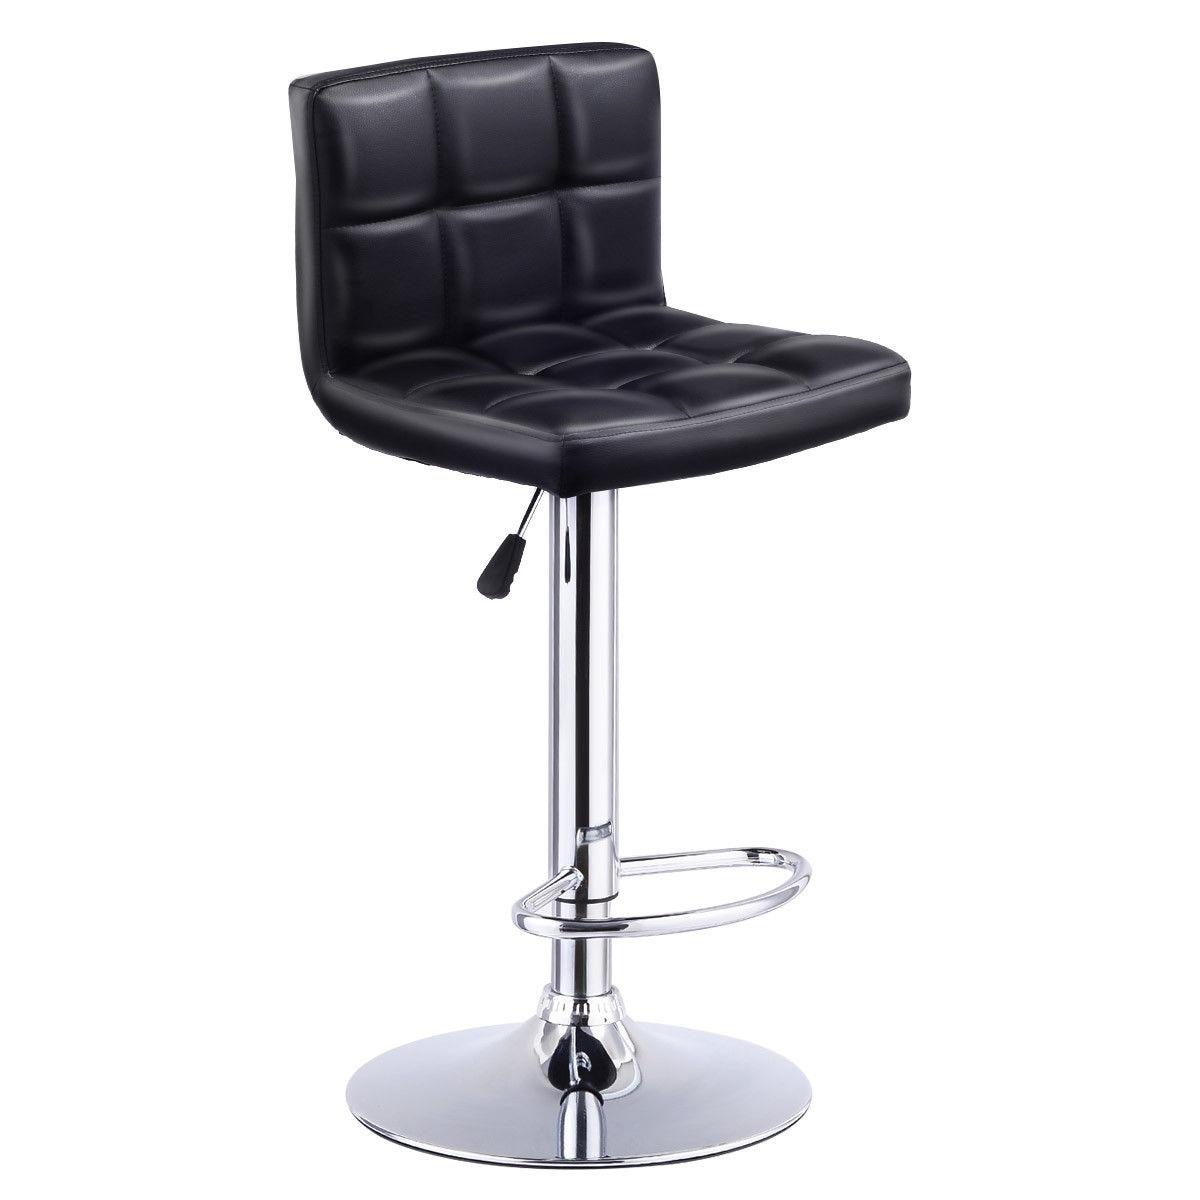 Giantex Bar Stool Swivel Adjustable PU Leather Barstools Bistro Pub Chair Modern Living Room Bar Furniture HW53843BK